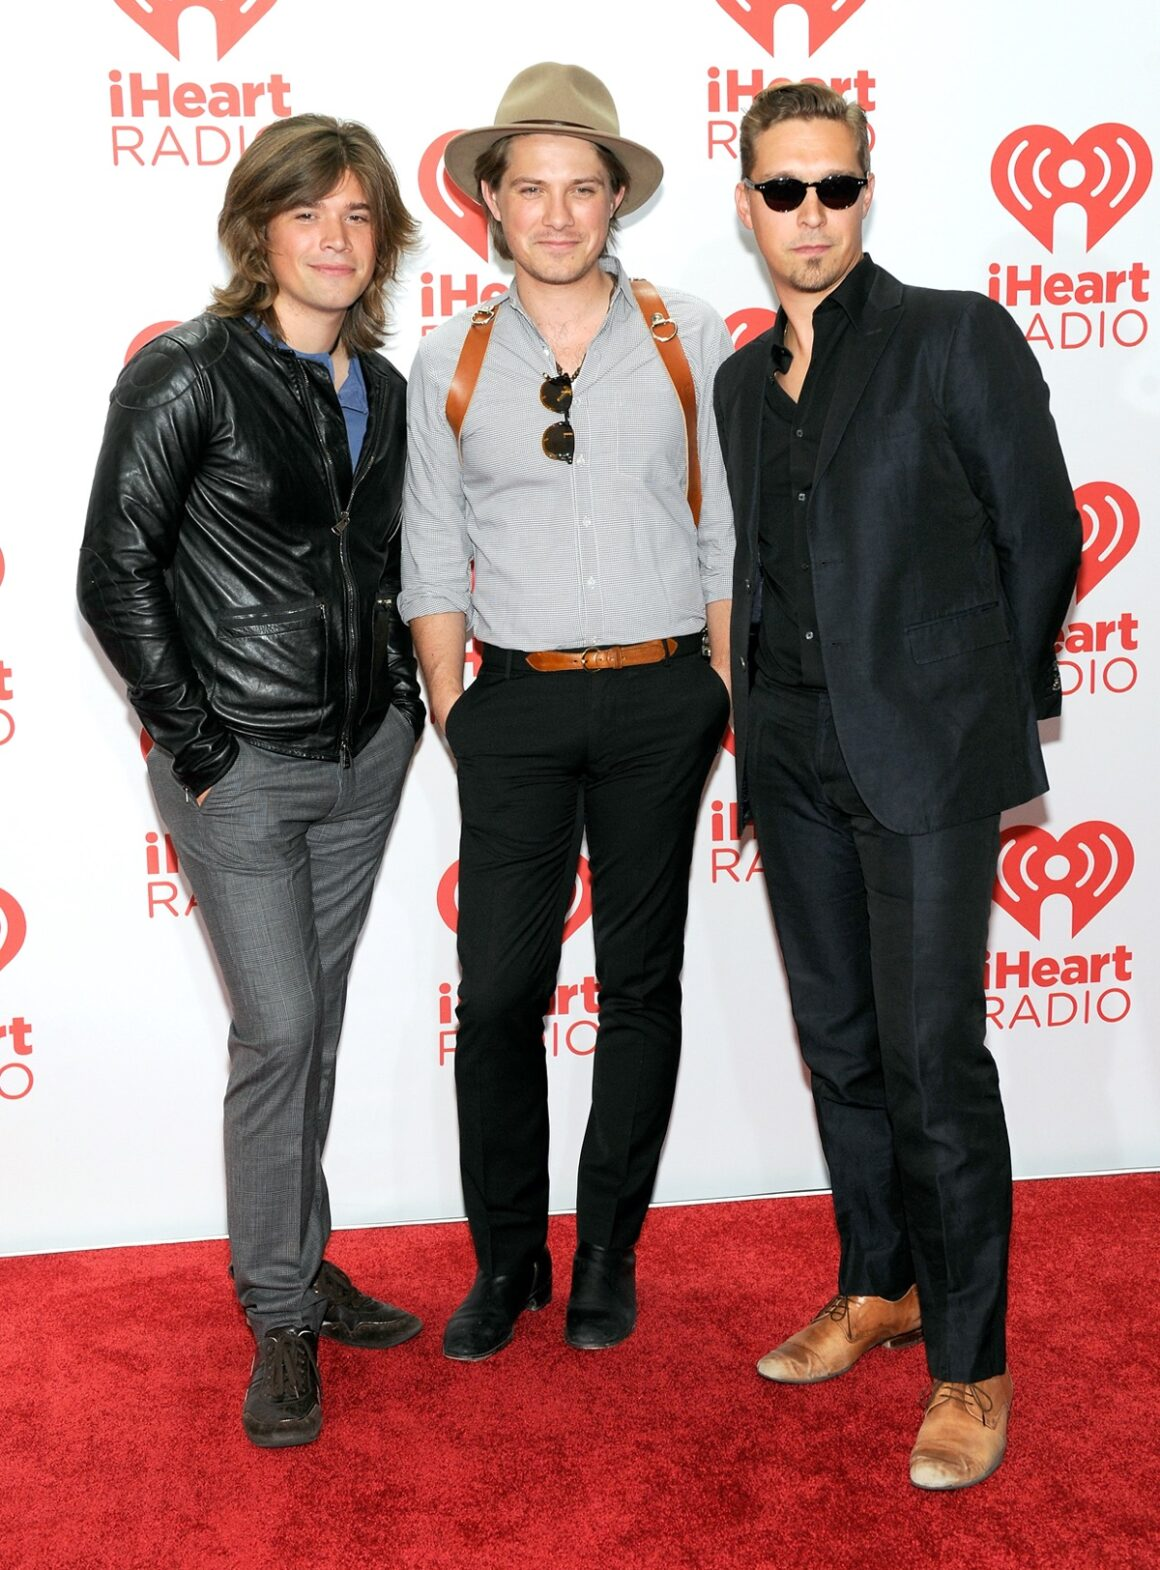 Hanson iHeartRadio Music Festival - Day 2 - Backstage